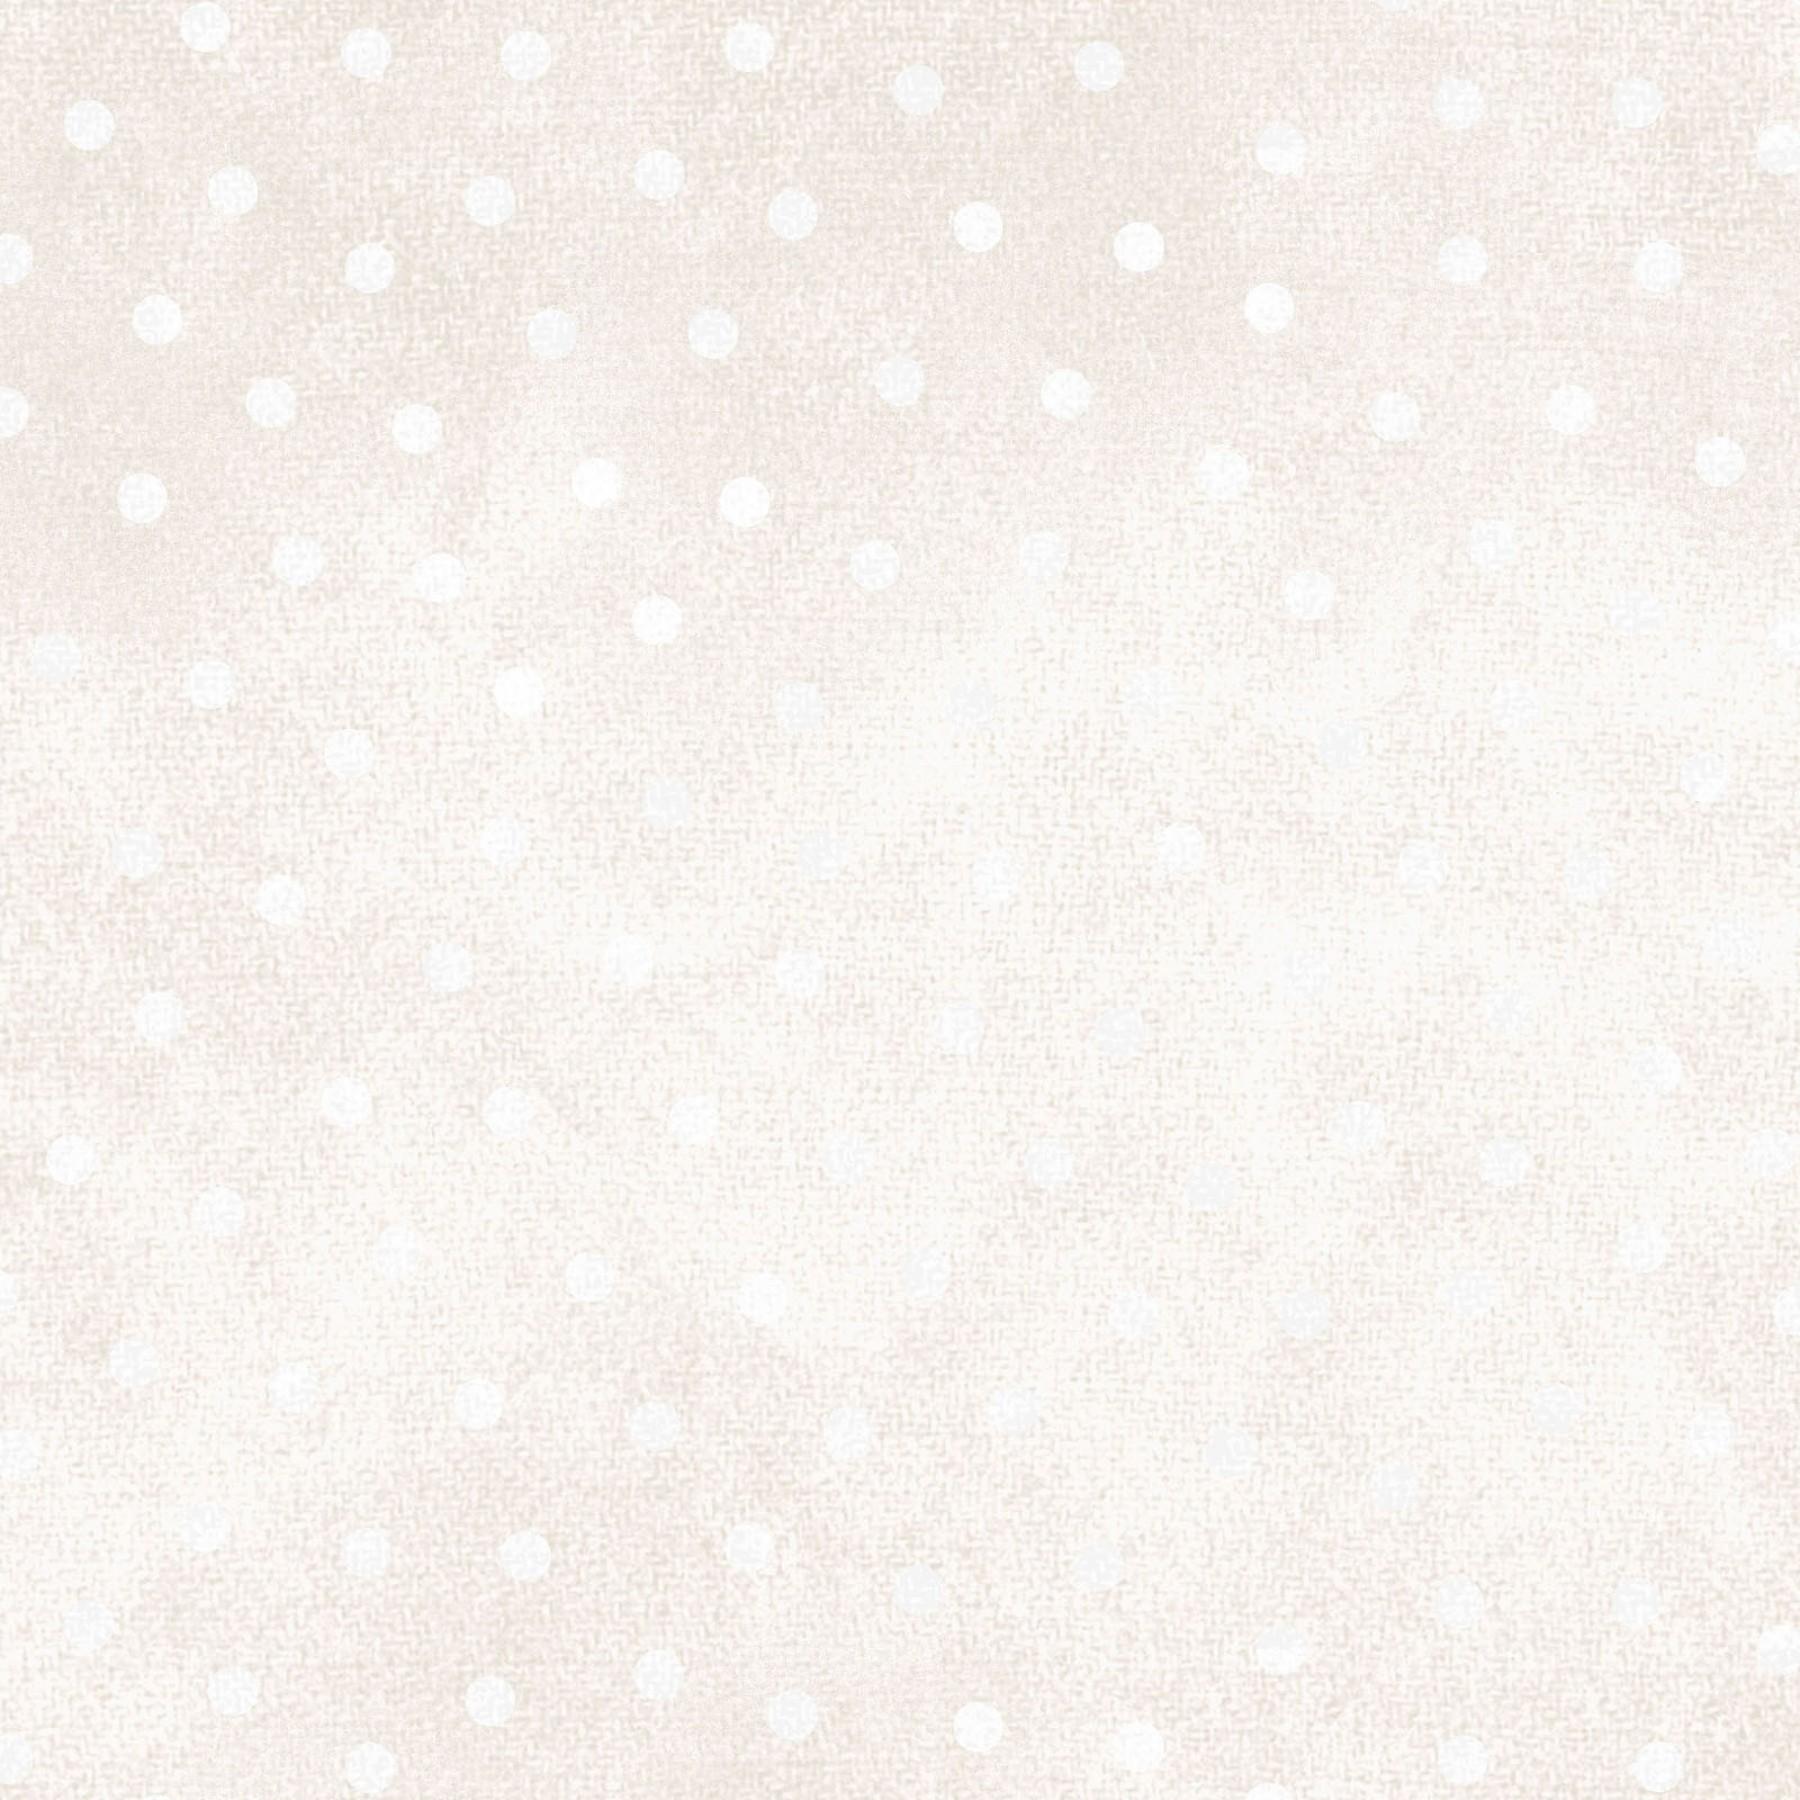 Woolies Flannel White/Cream Dot by Maywood Studio